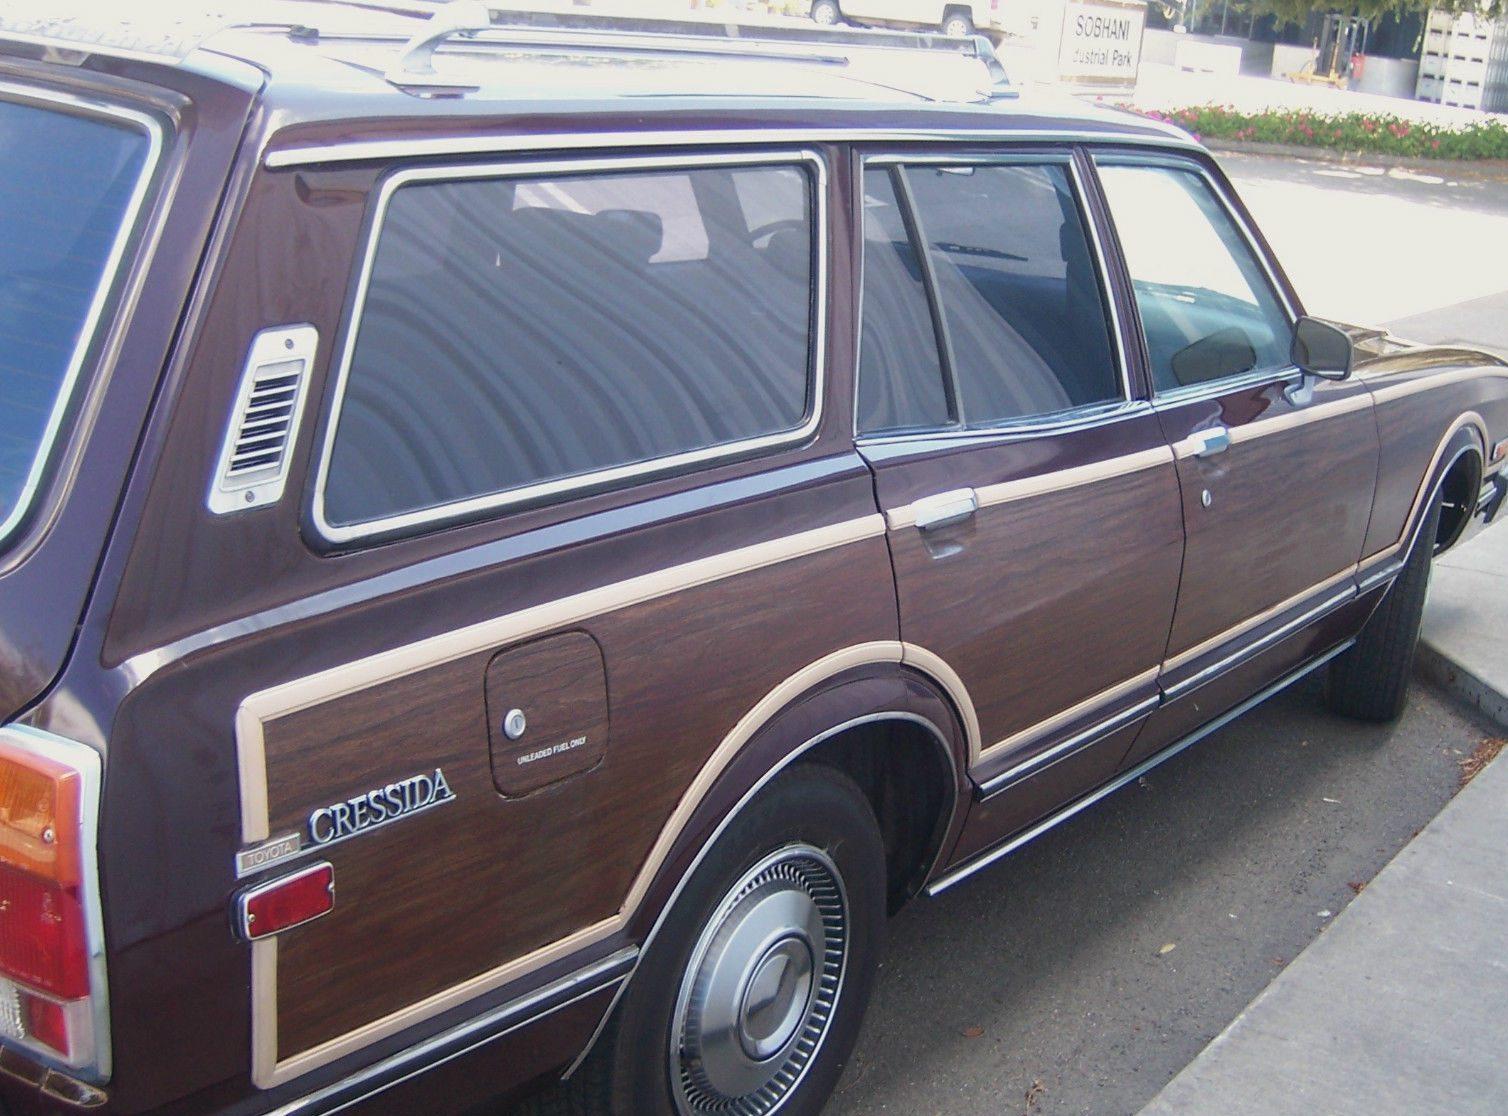 Toyota Of Hickory >> Asian Woody: 1978 Toyota Cressida